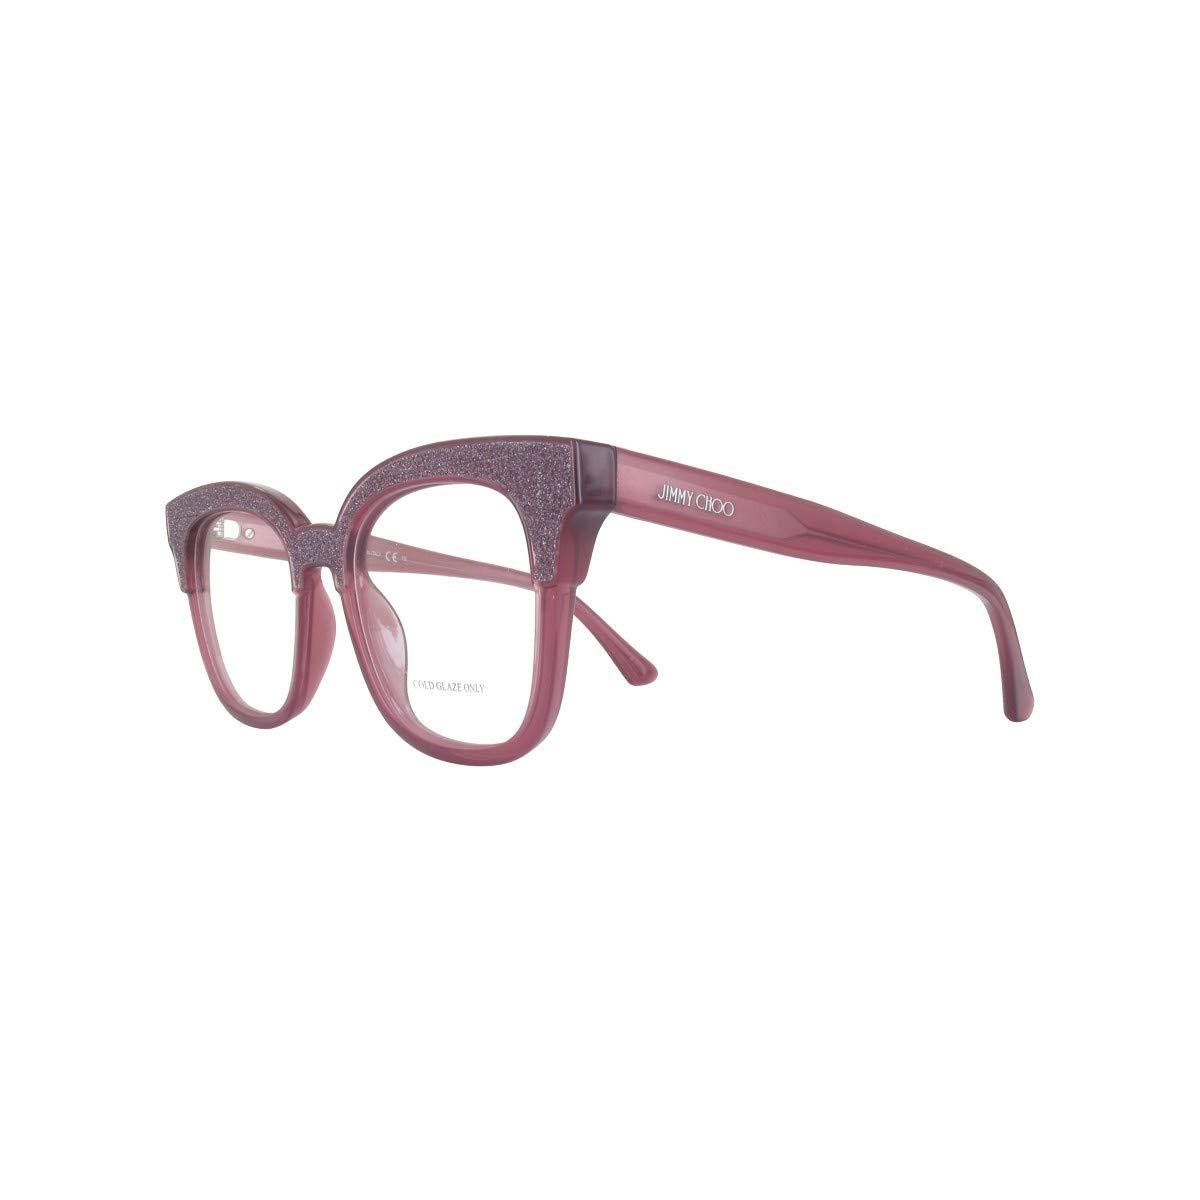 cb2f005b81e3 Eyeglasses Jimmy Choo Jc 176 018R Dark Gray Glittergy at Amazon Women s  Clothing store